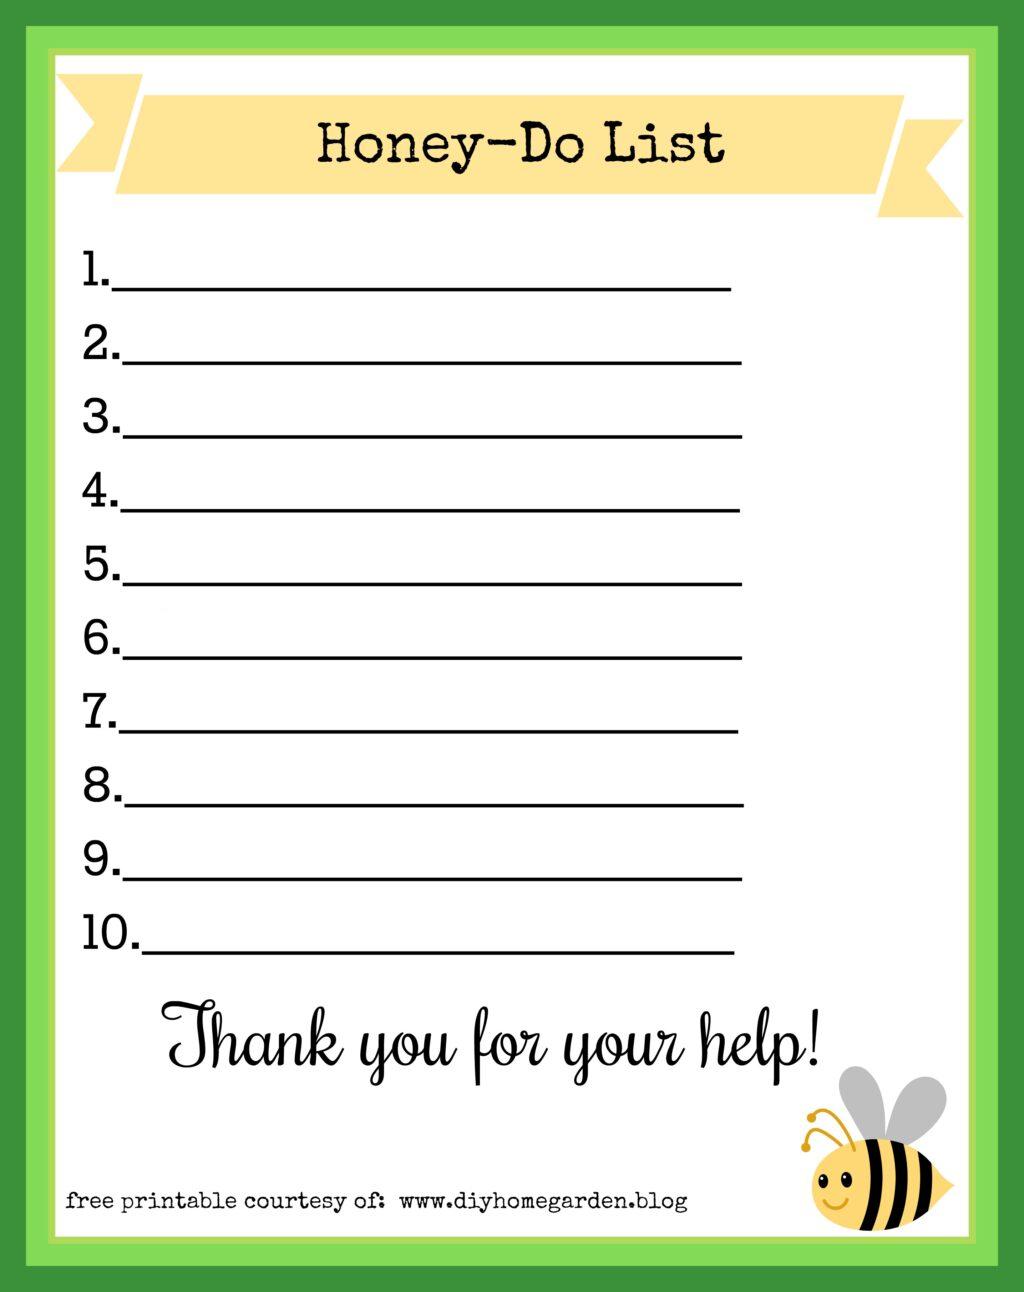 free printable honey-do list